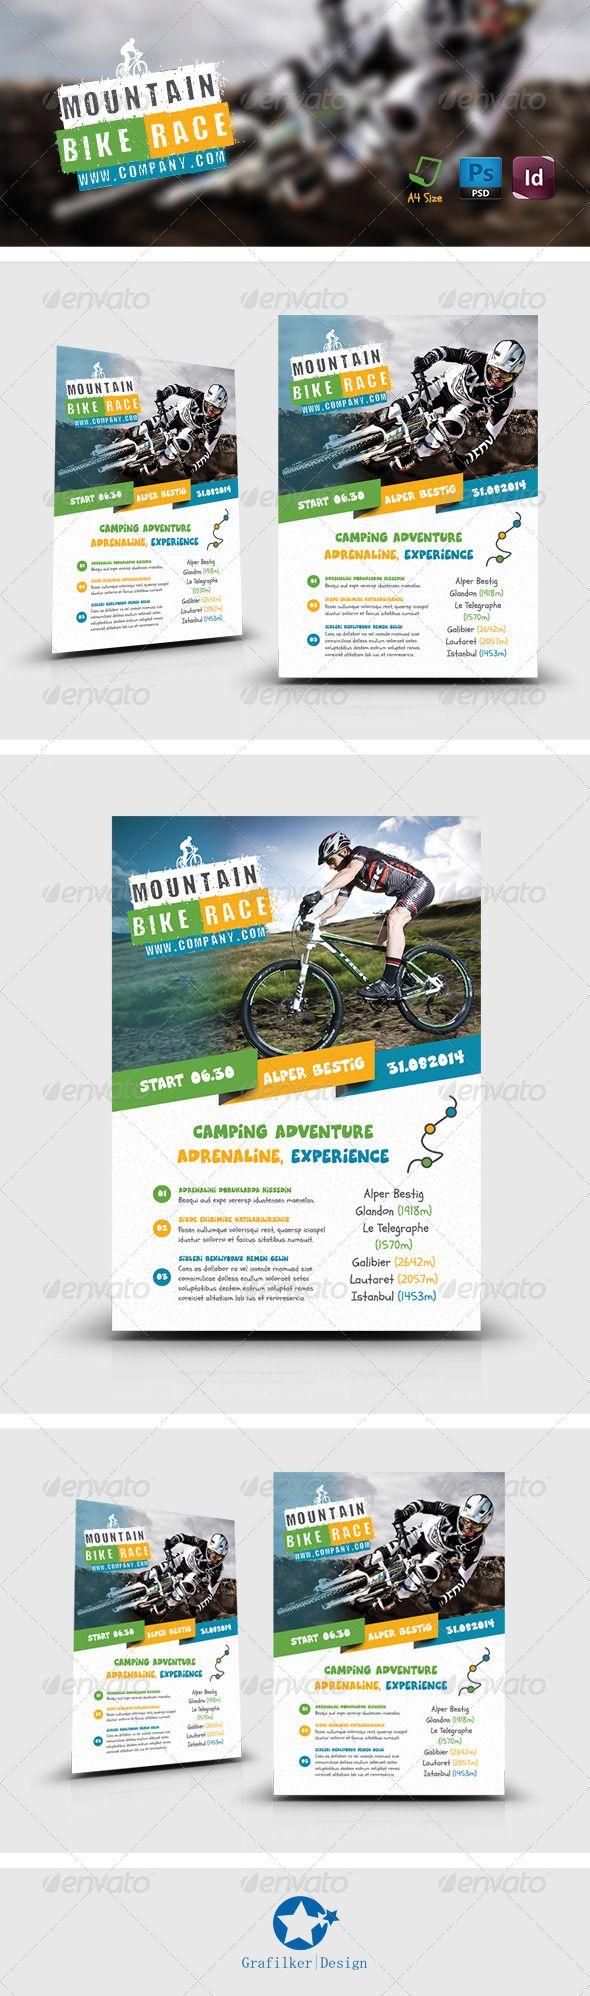 Bicycle Racing Flyer Templates